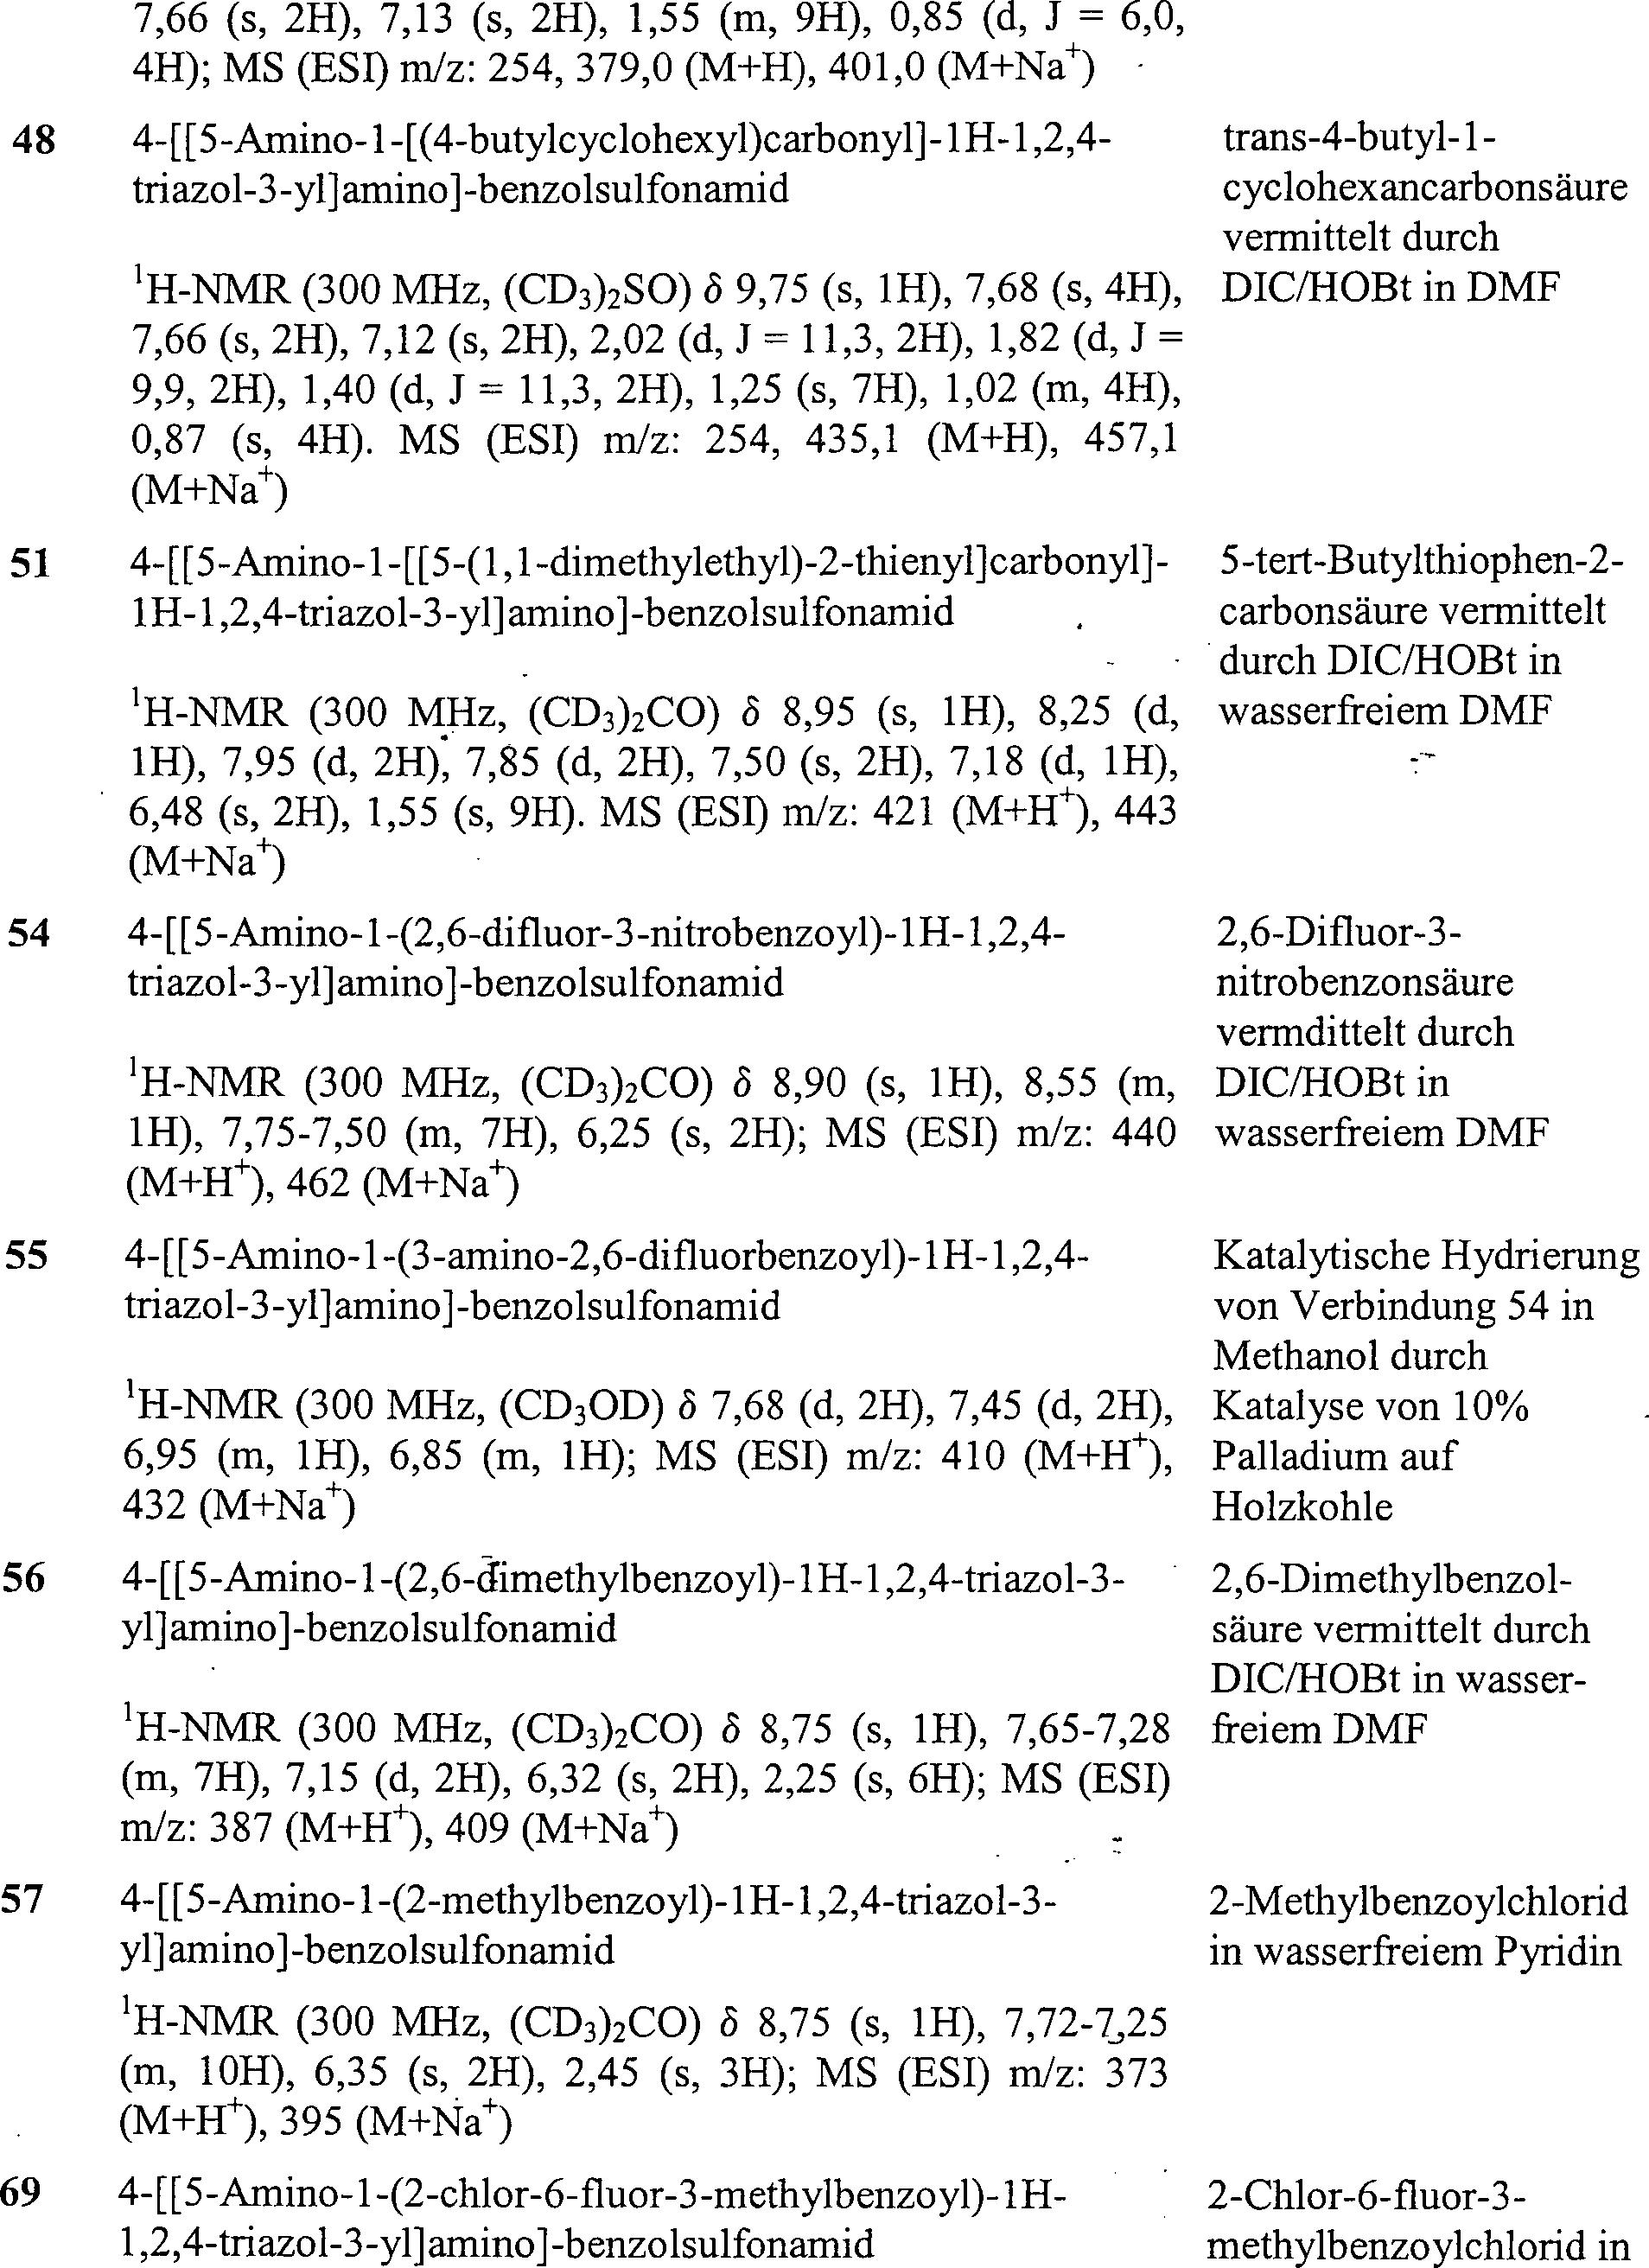 Figure 00360001